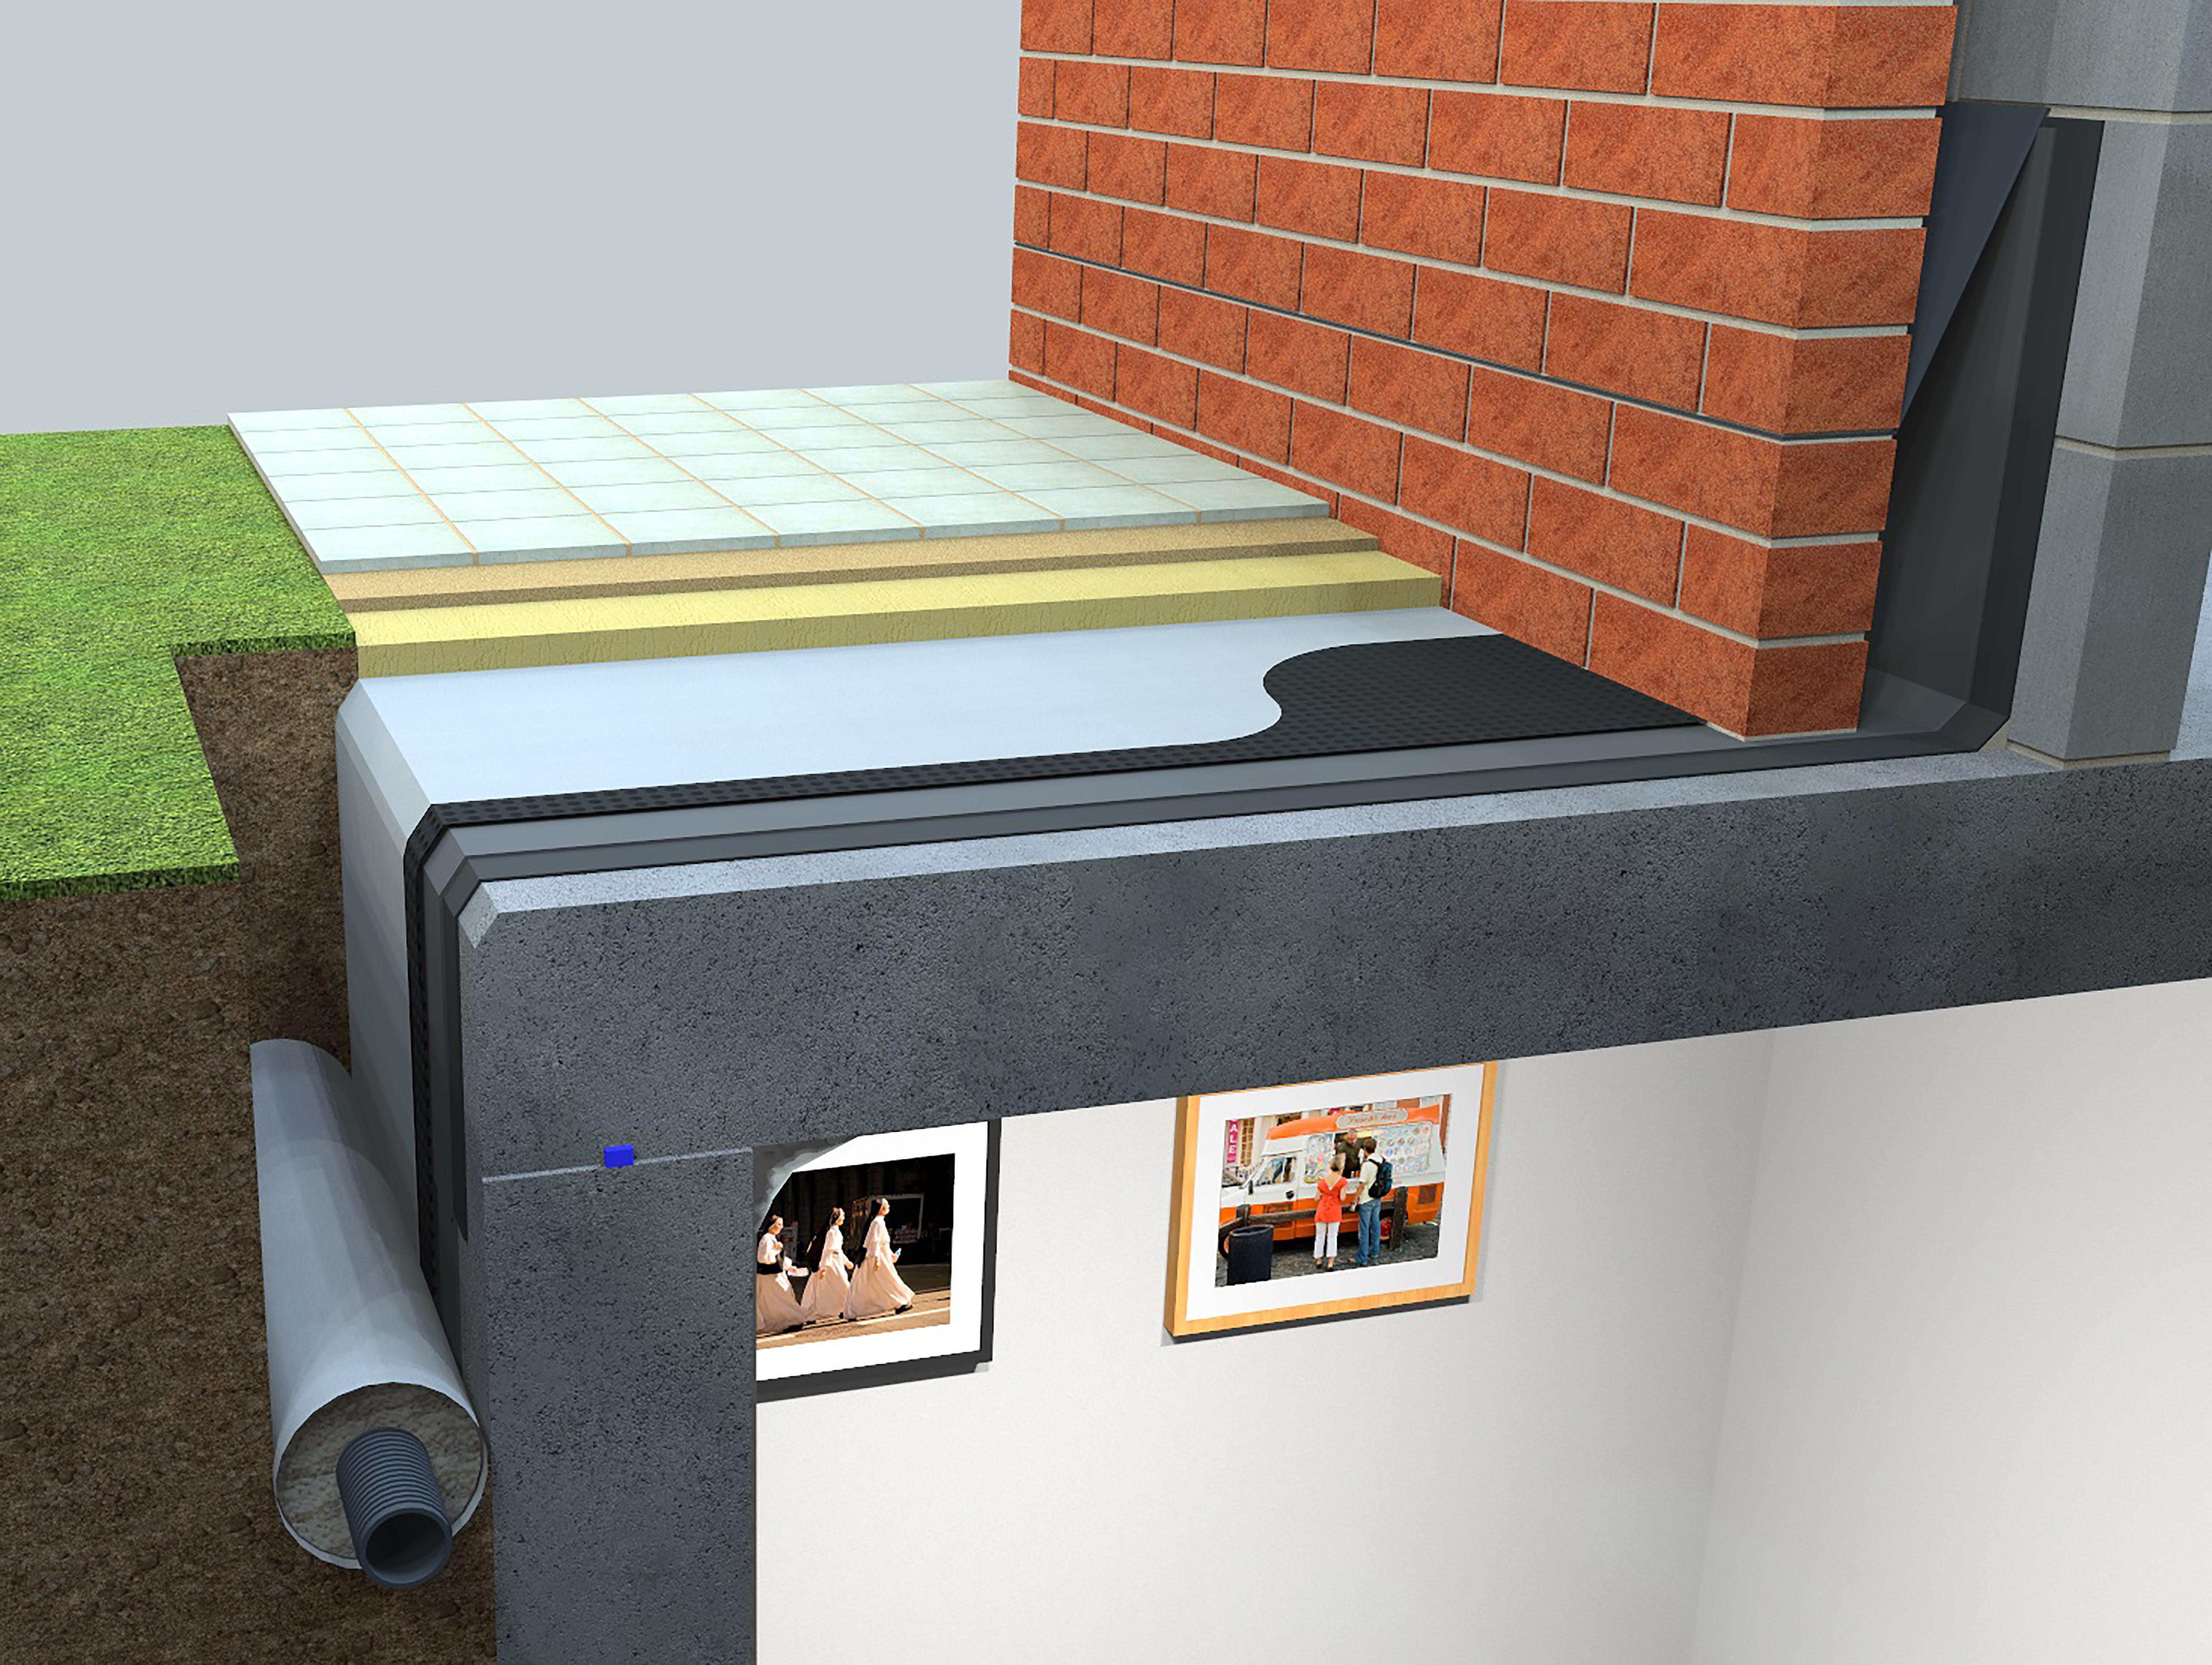 Newtons complete range of deck waterproofing solutions